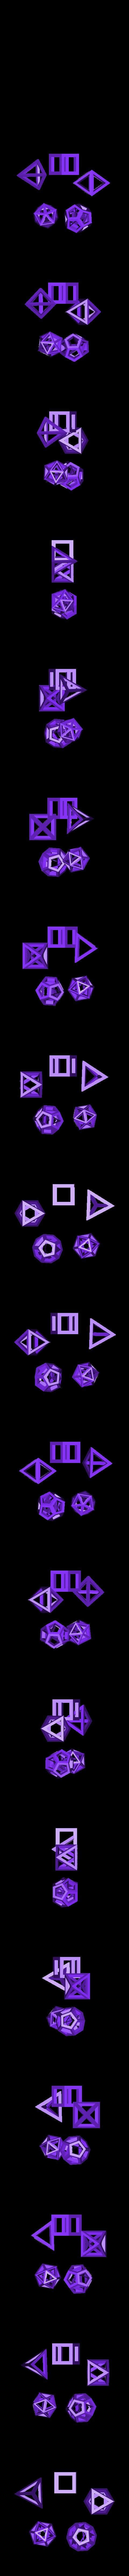 platonic.stl Download free STL file Customizable Convex Polyhedra • 3D printable template, Ristrorg